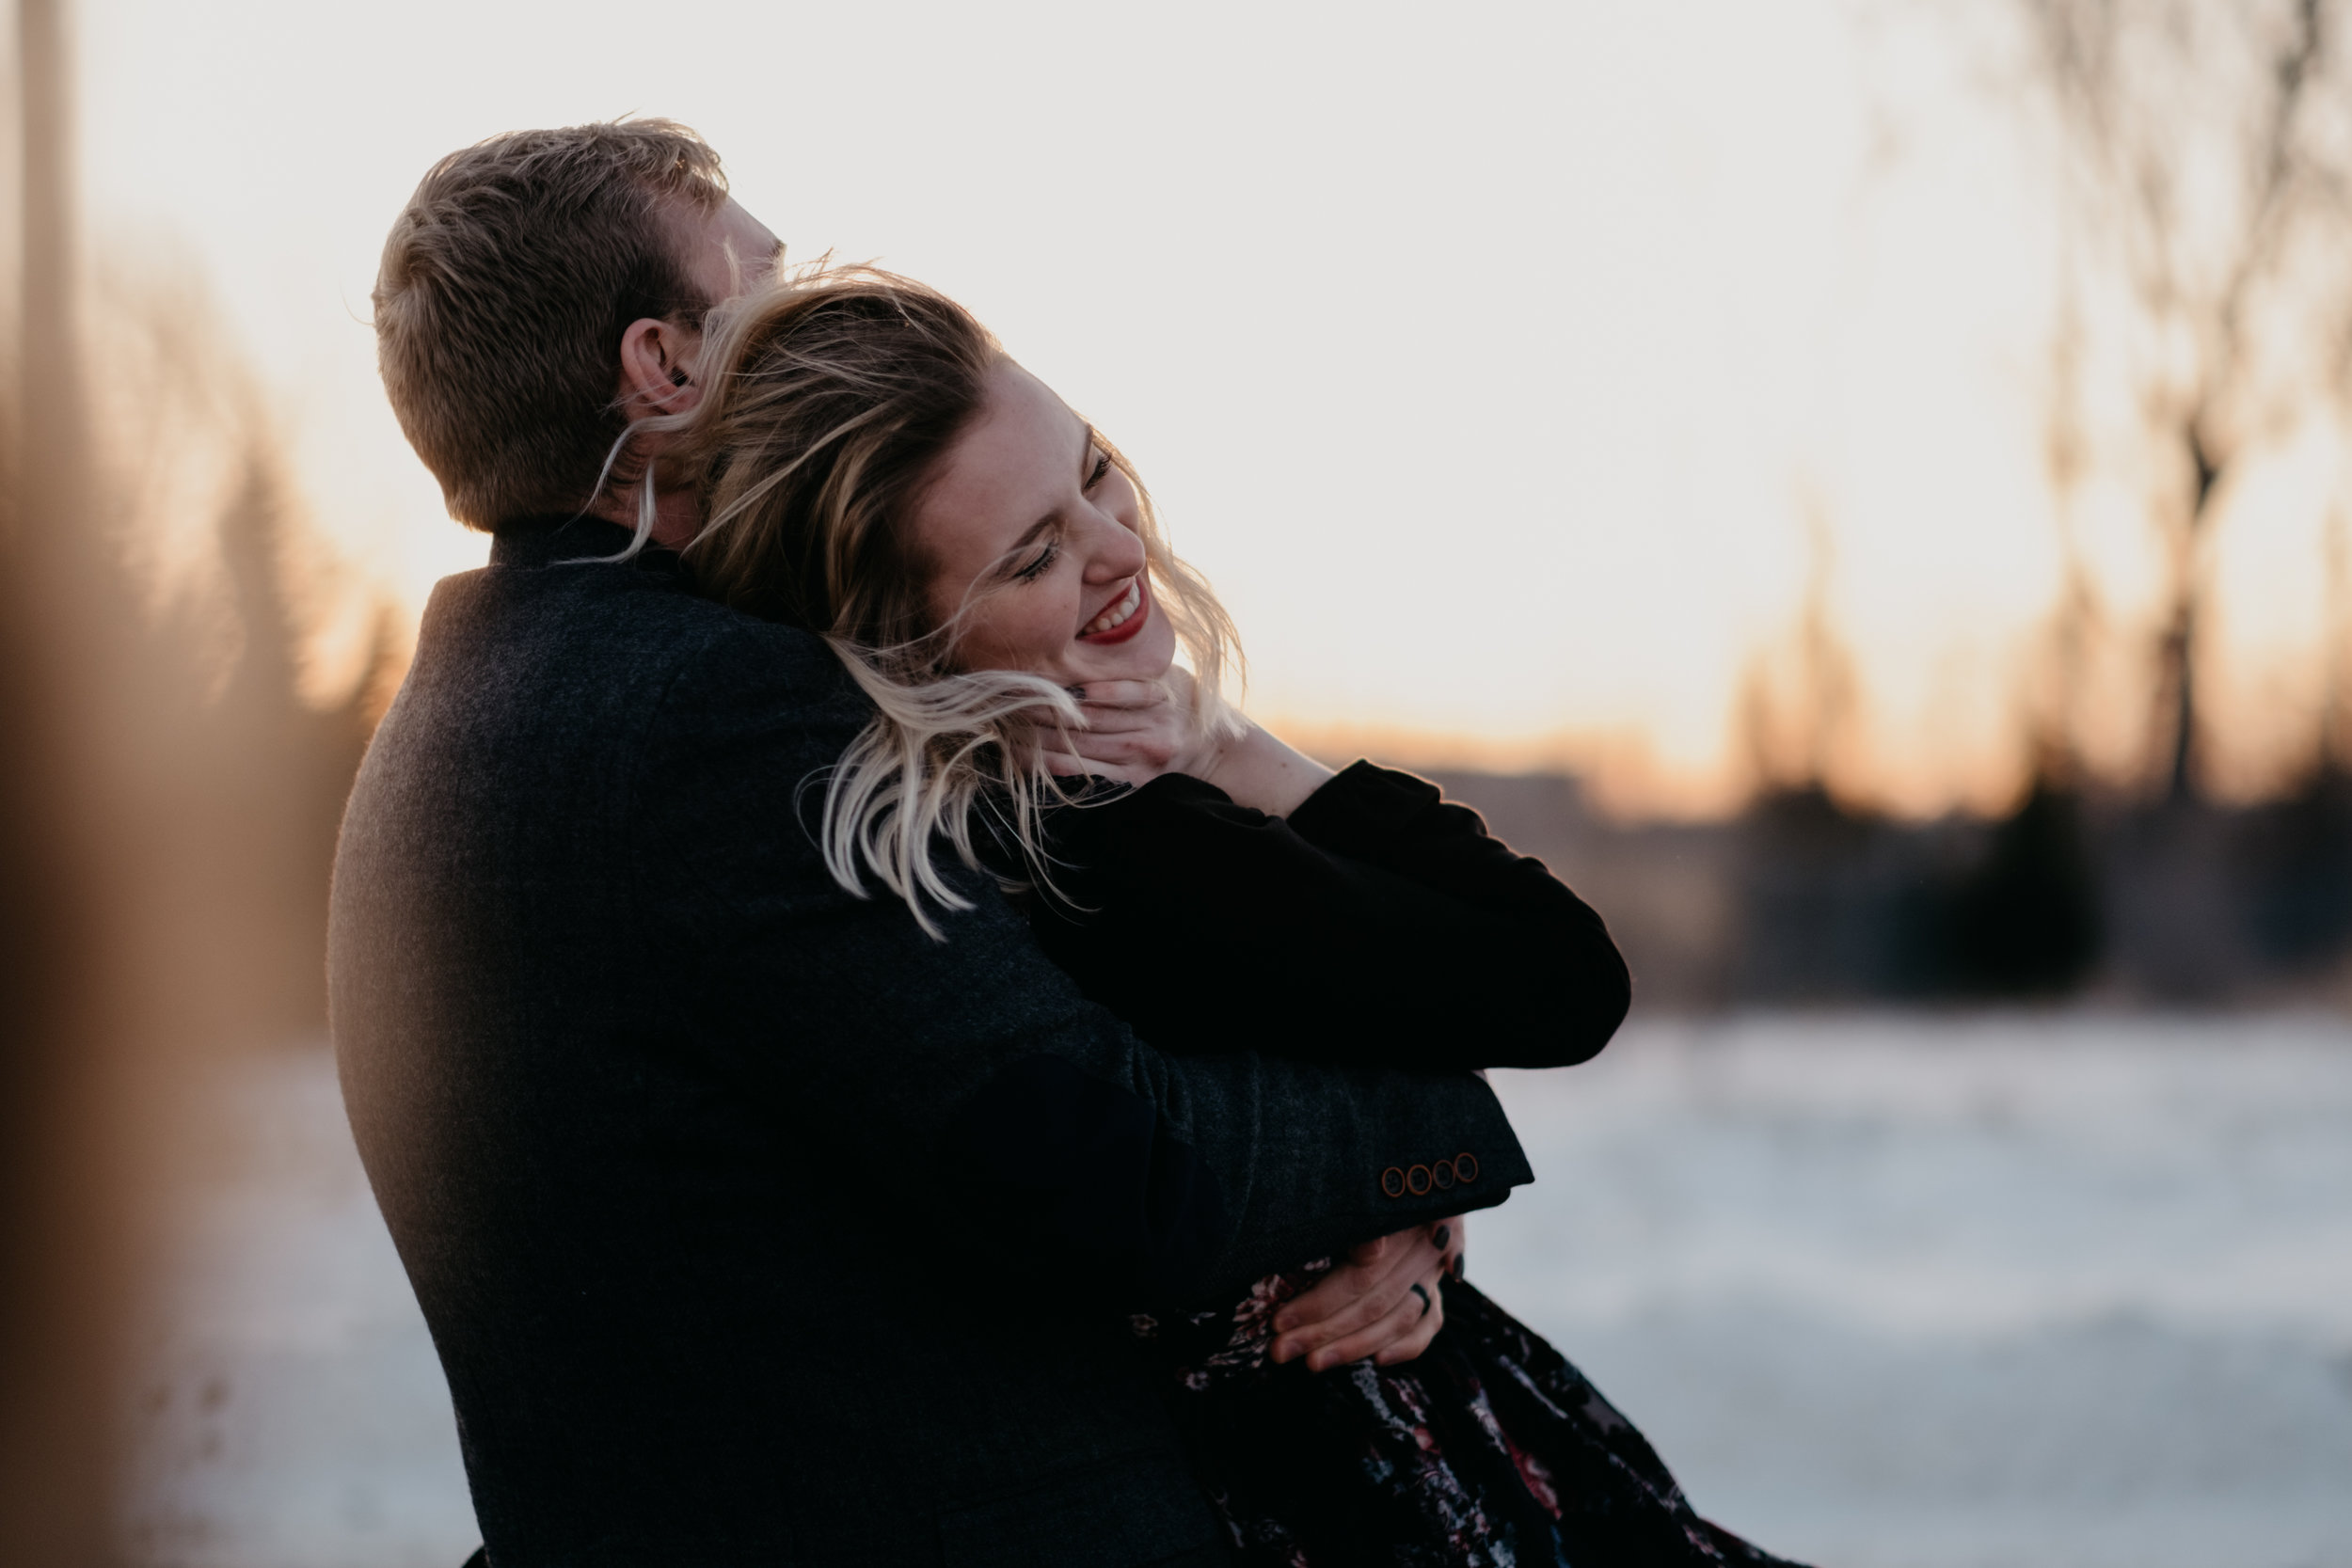 Talia + Brendan | Engagement Photography | Sioux Falls, South Dakota Photographer-153.jpg